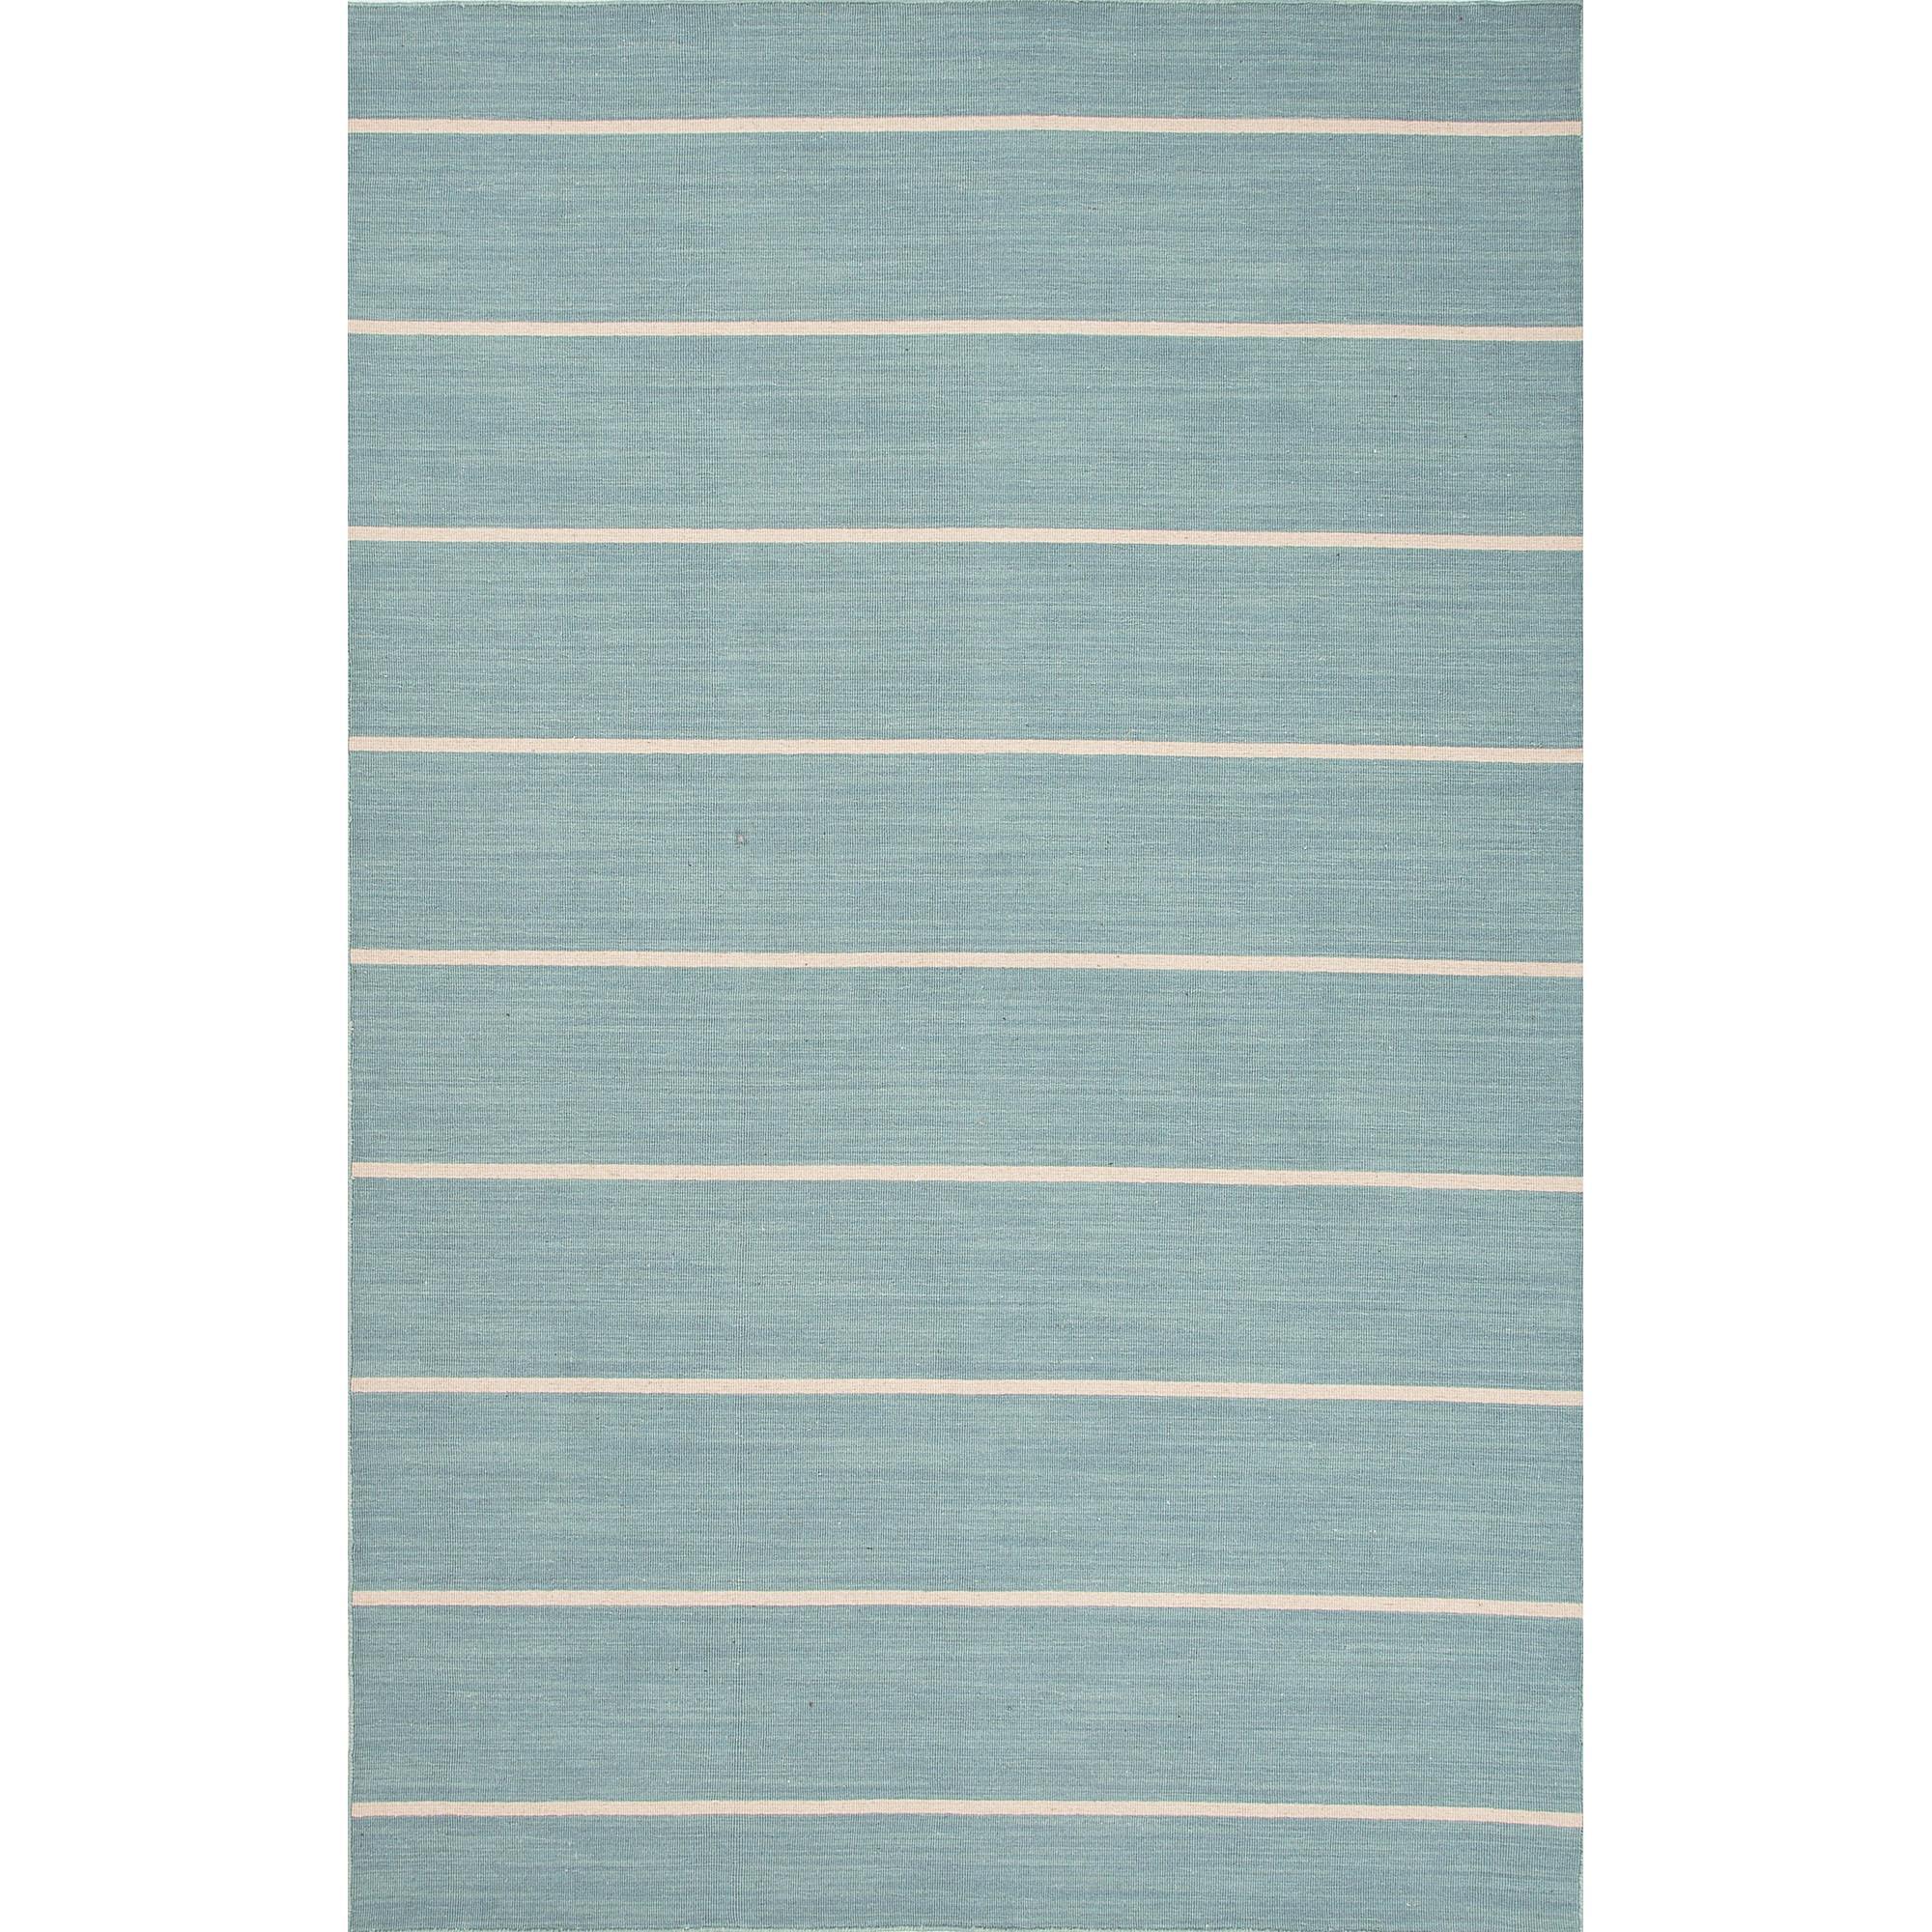 JAIPUR Rugs Coastal Shores 8 x 10 Rug - Item Number: RUG125067